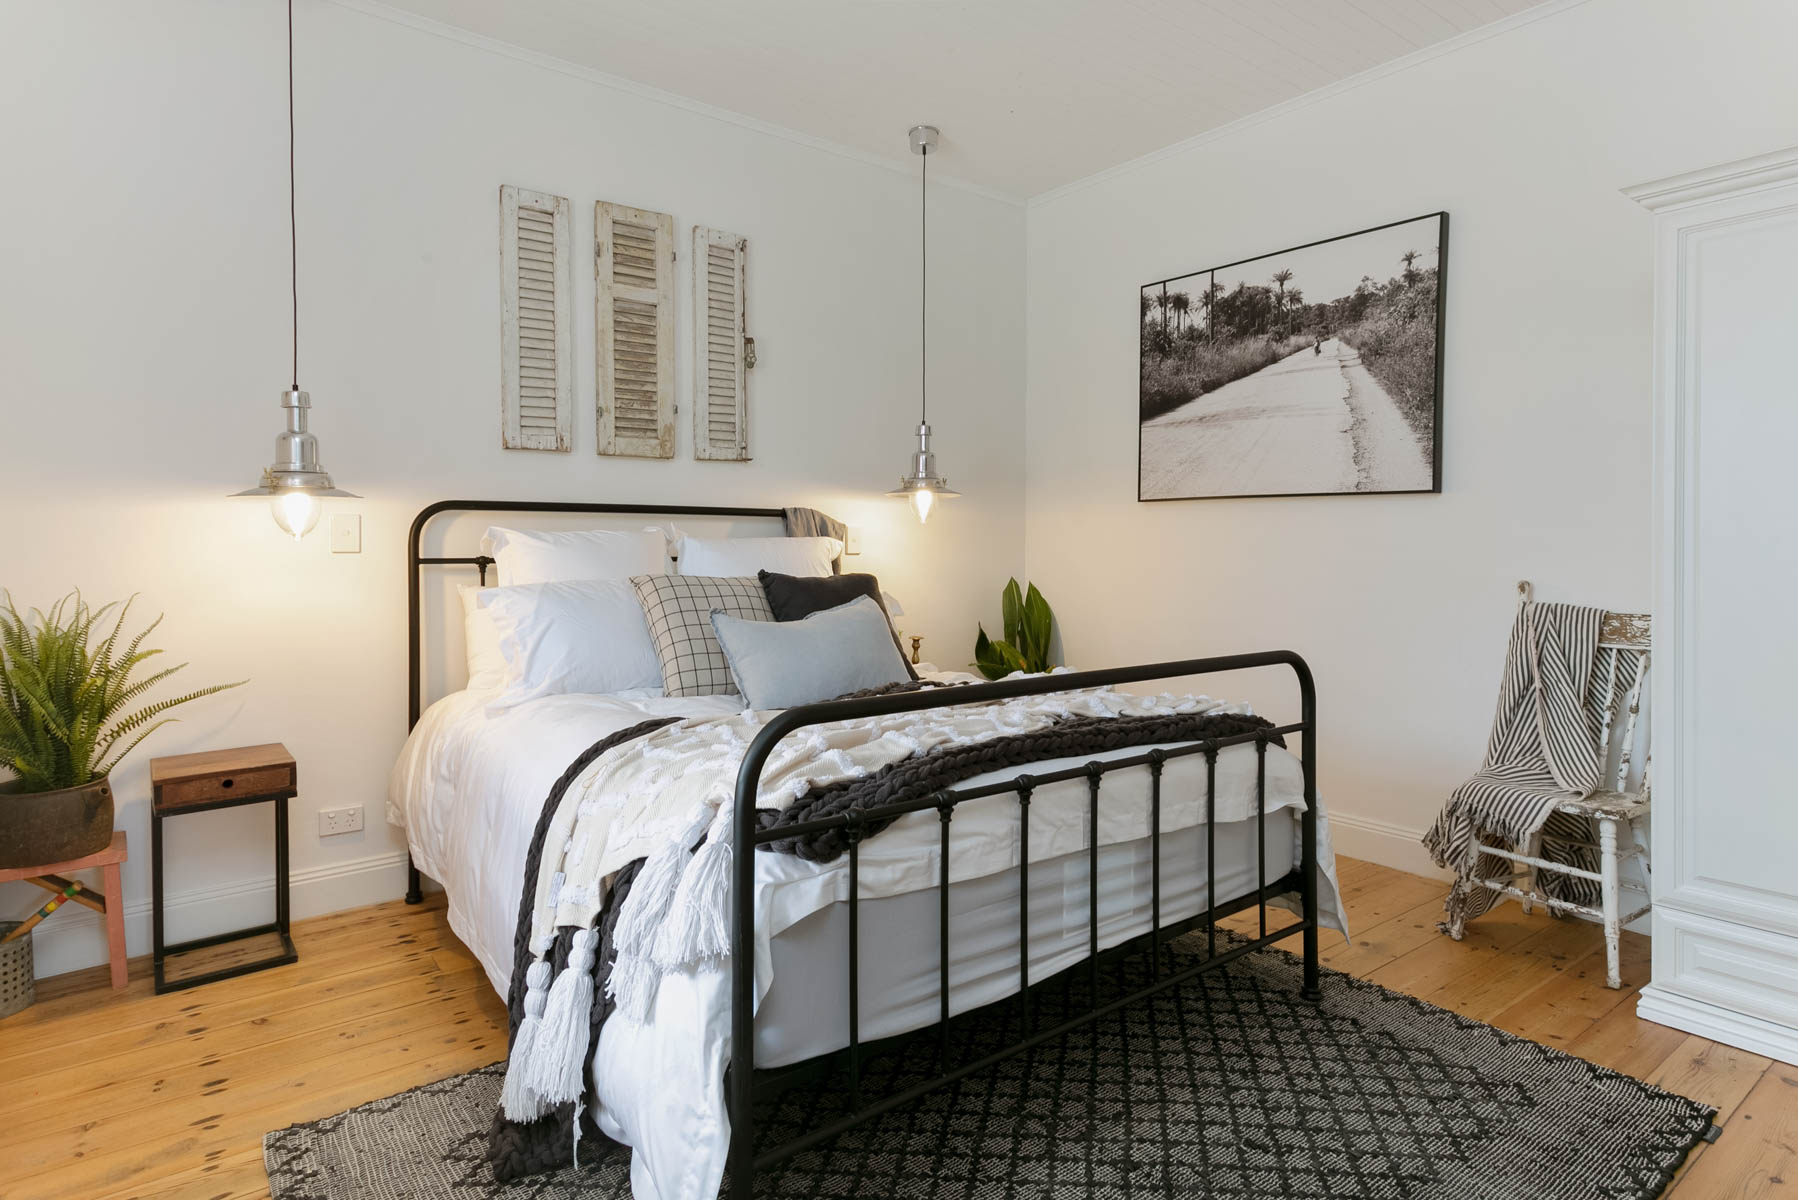 Renovation, Restoration, Extensions, Design, Builders, Goolwa, Fleurieu, Cottage, Award Winning, Luxury Bedroom, Feature Light, Wooden Floors